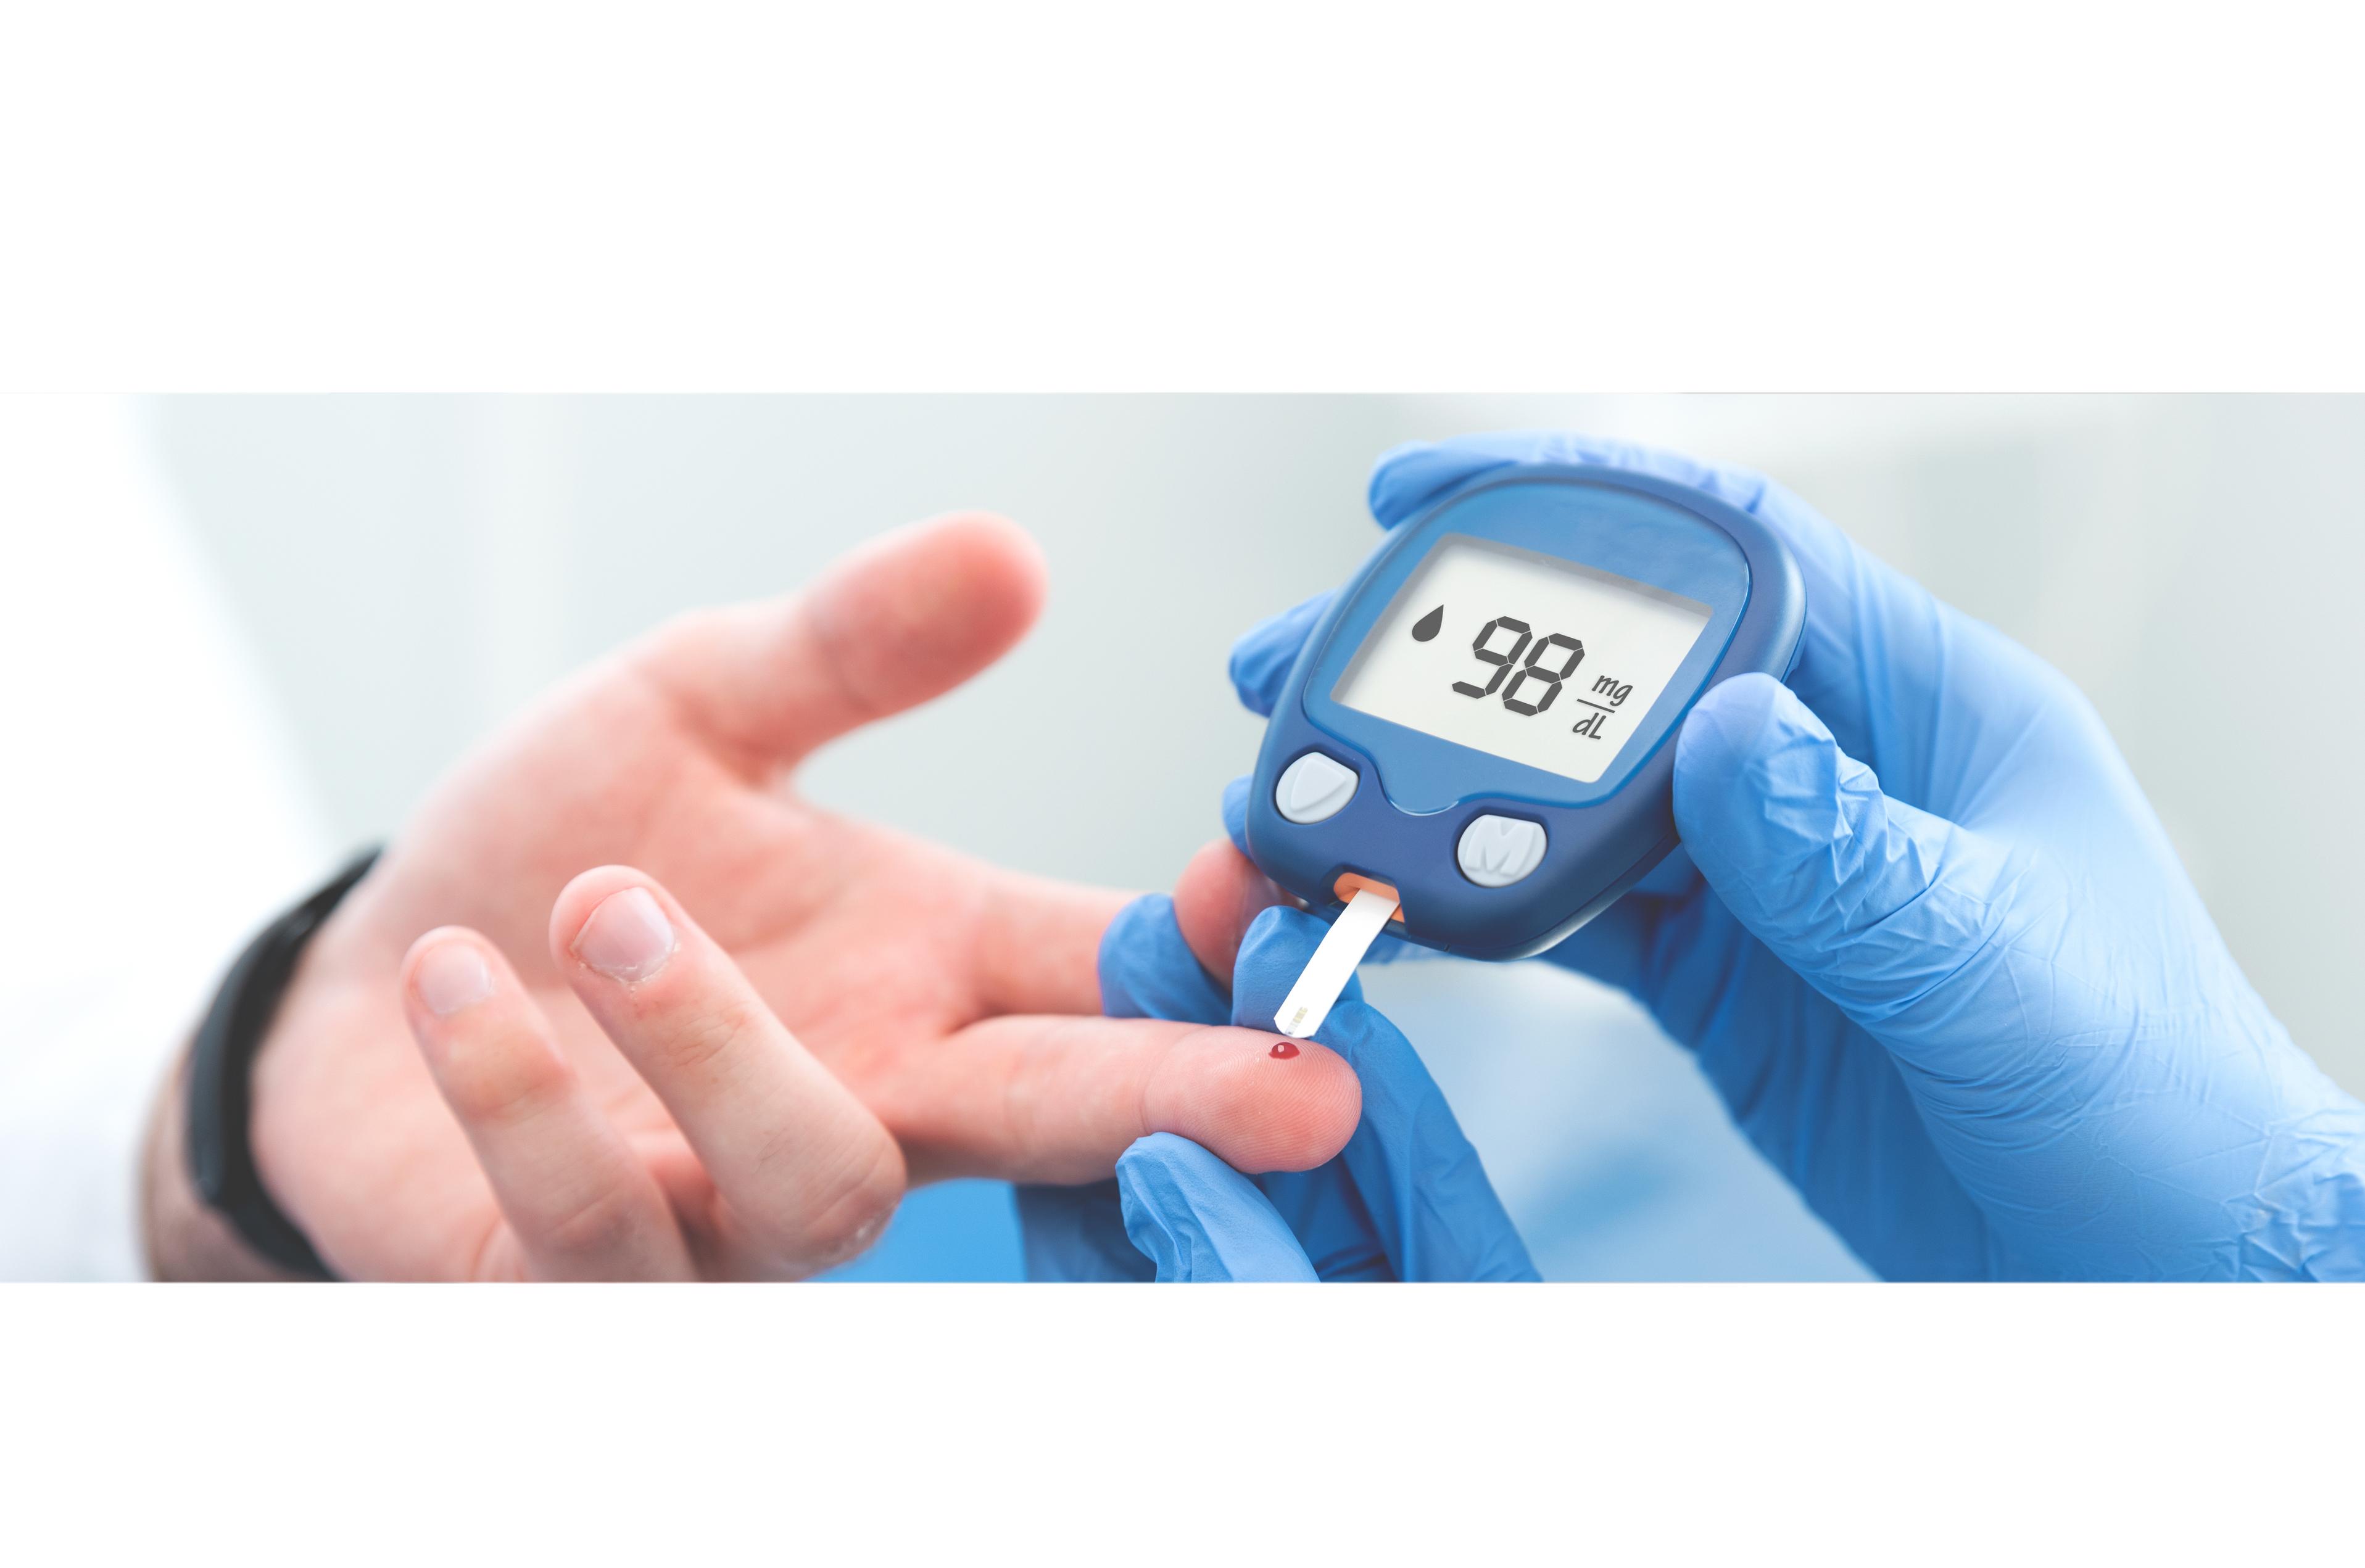 Diabetes - Symptoms, Causes, and Treatment